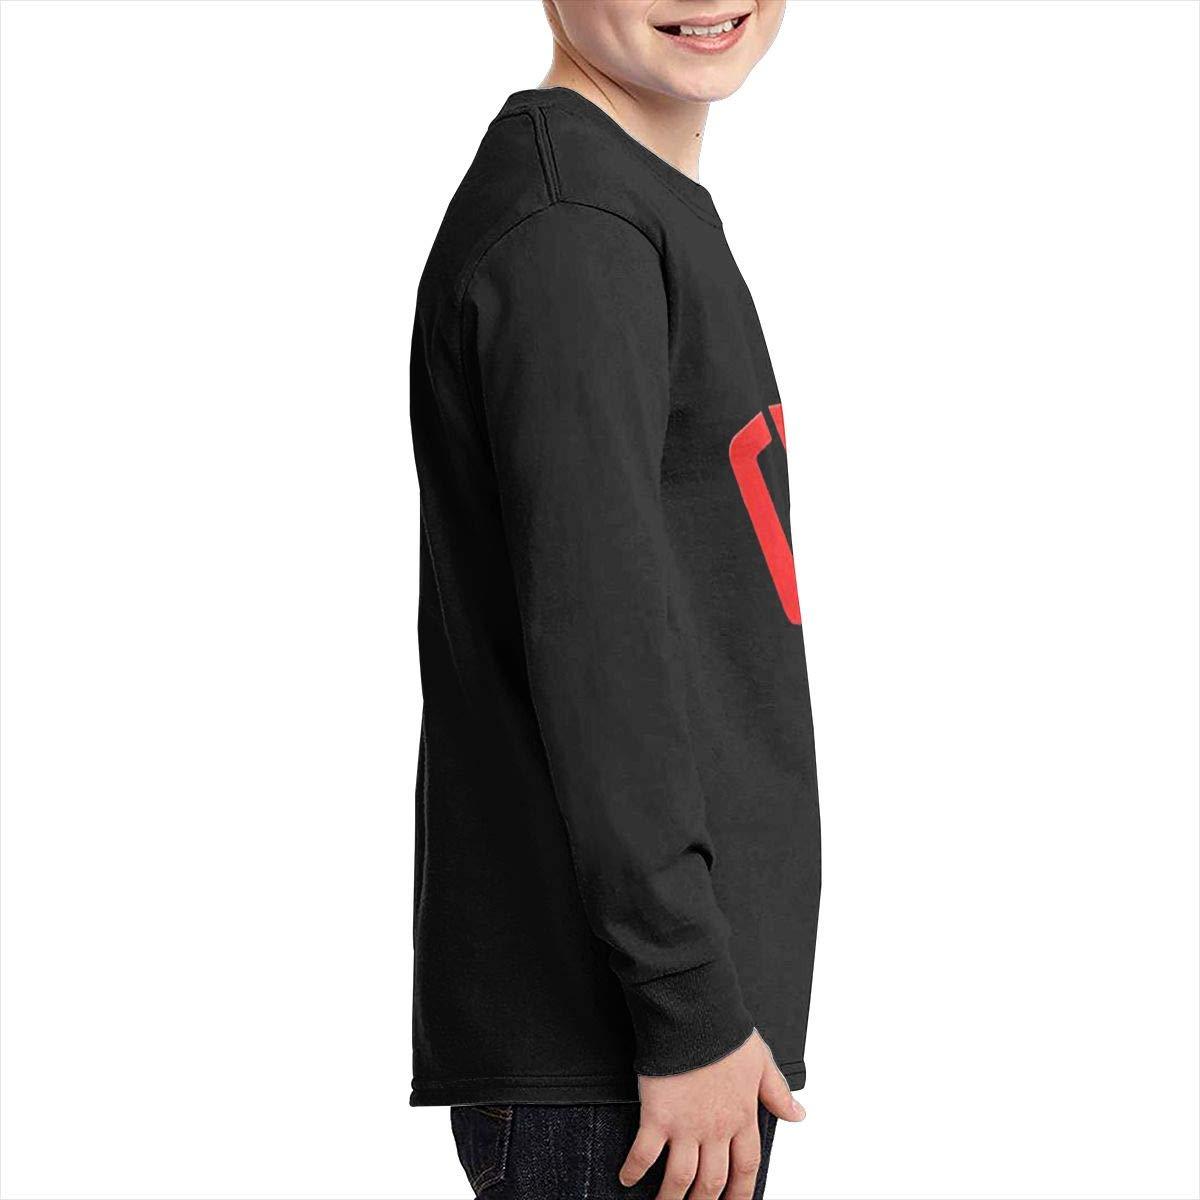 MDClothI Youth Boys /& Grils Ch-ad Wild Clay Classic Long Sleeve T-Shirt